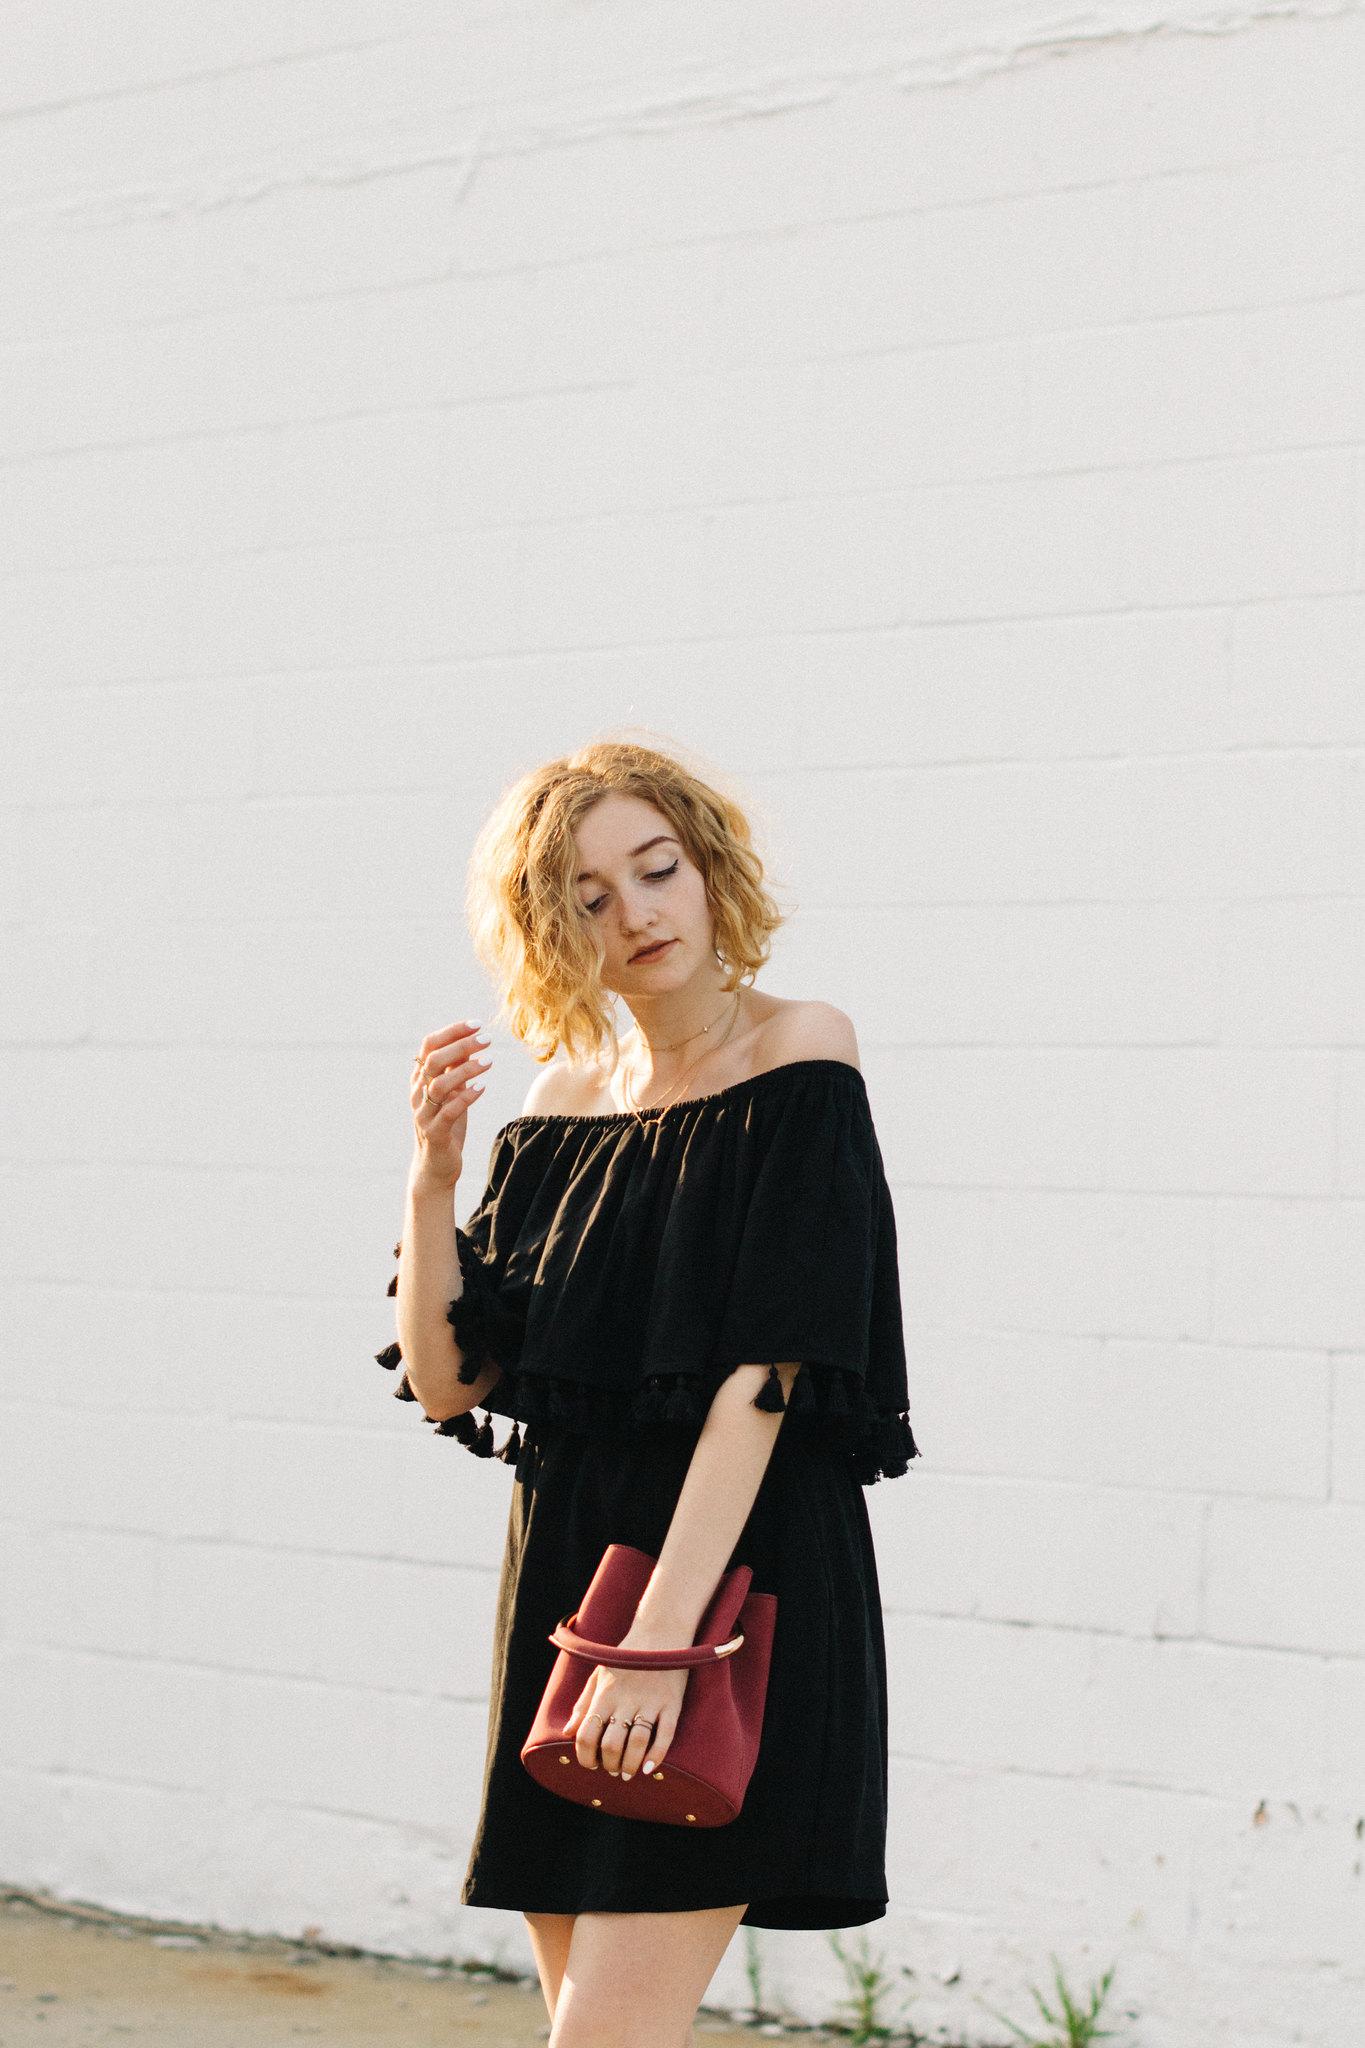 Vetta Capsule and Who What Wear shot by Lauren O'Neil on juliettelaura.blogspot.com